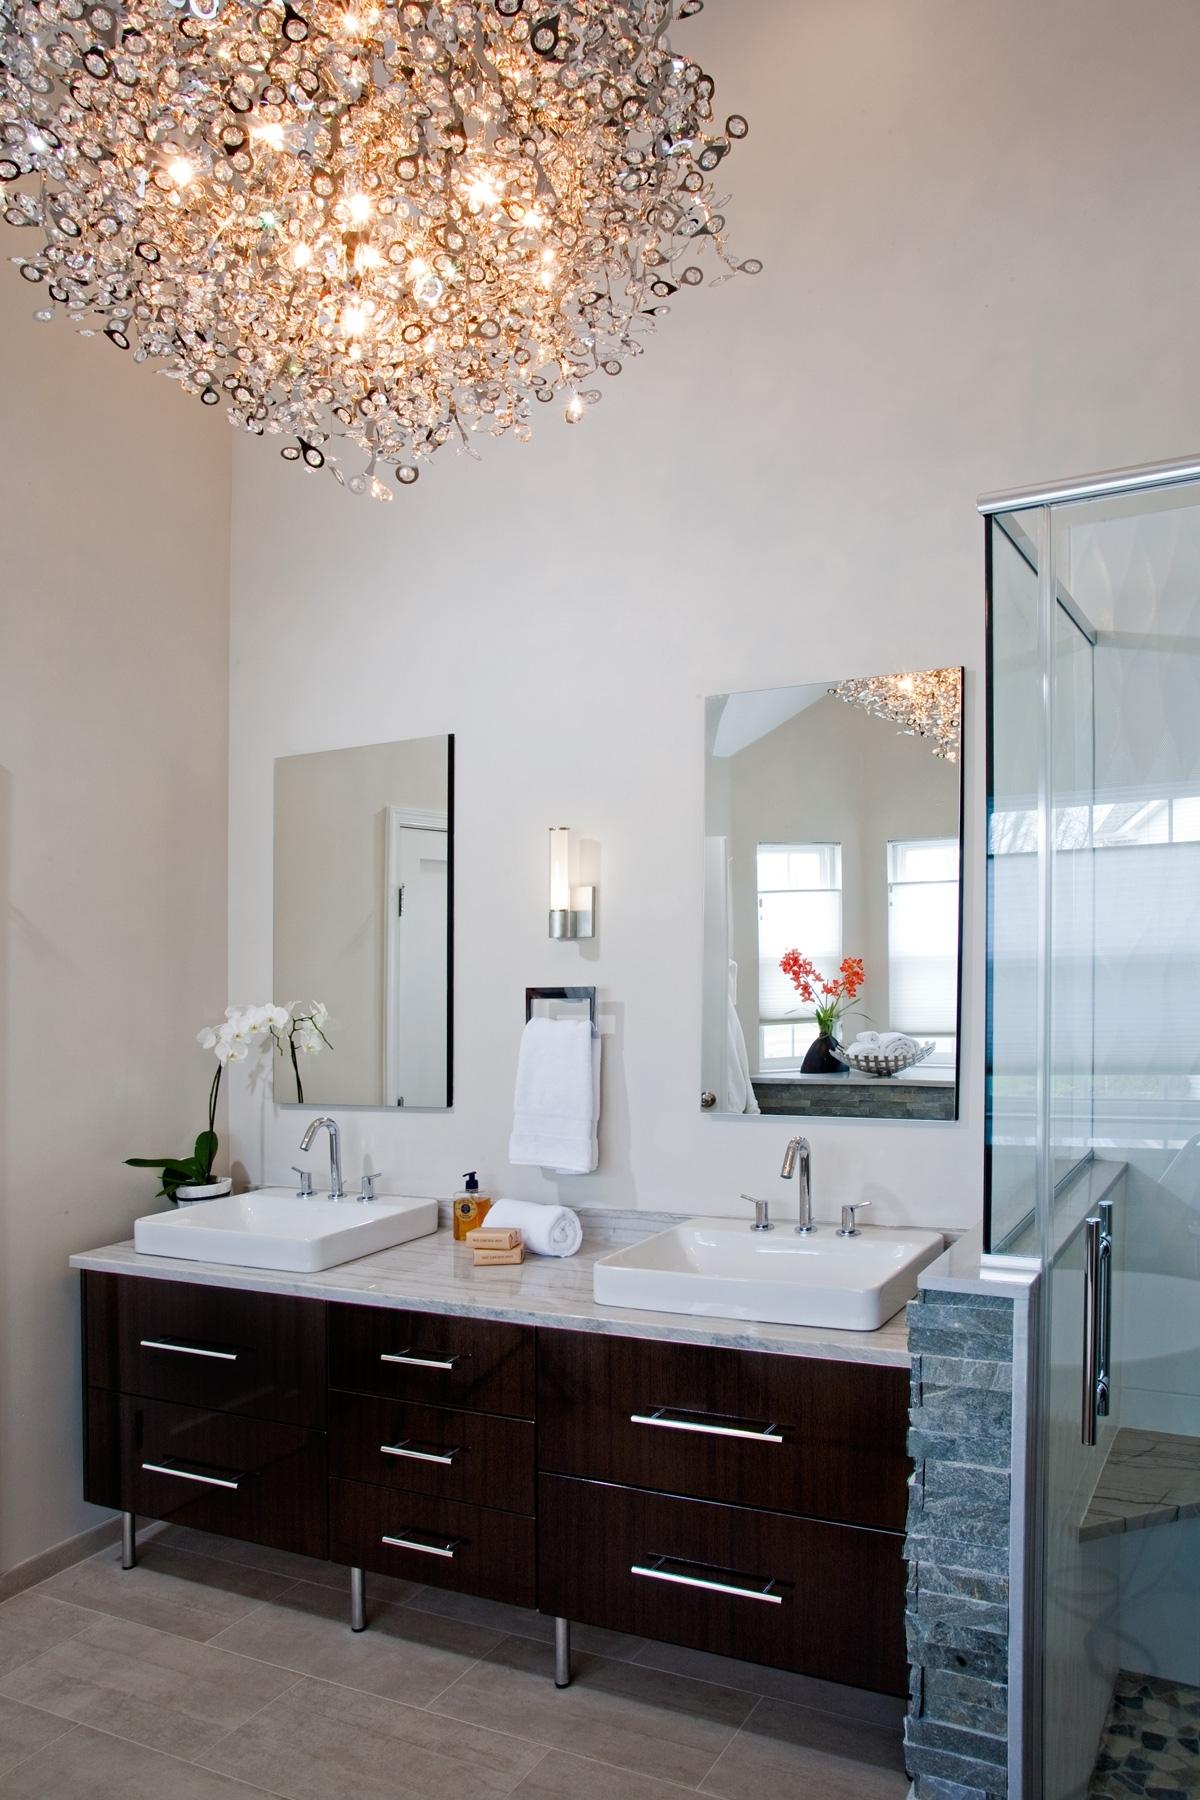 Htrenovations In Modern Bathroom Chandelier Lighting (View 12 of 15)